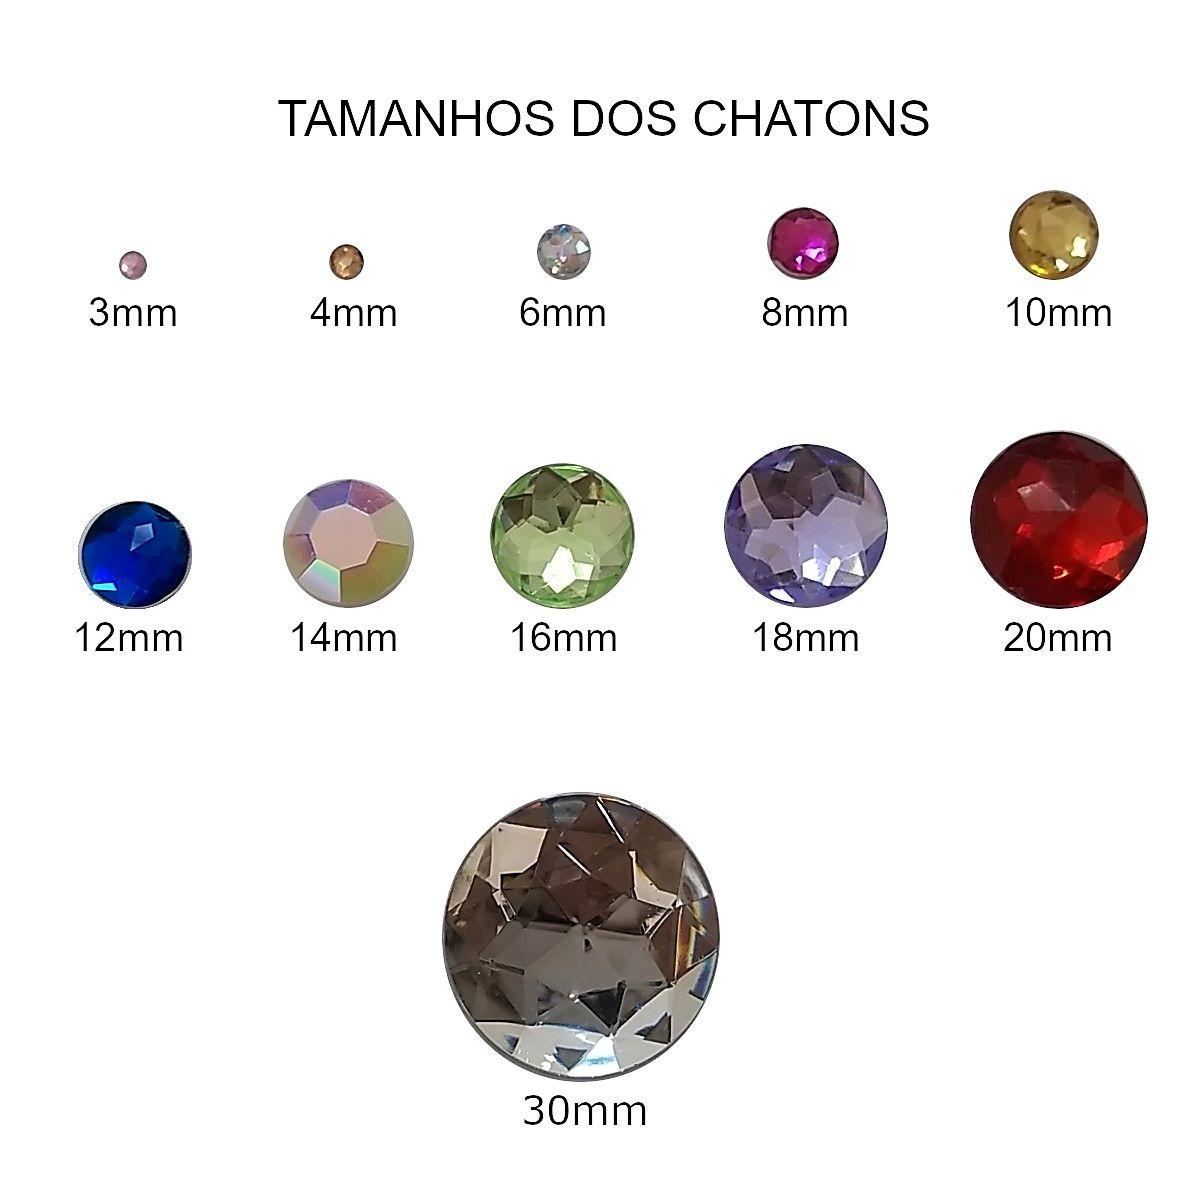 Chaton Costura Redondo Caramelo 6mm a 16mm  - SanBiju